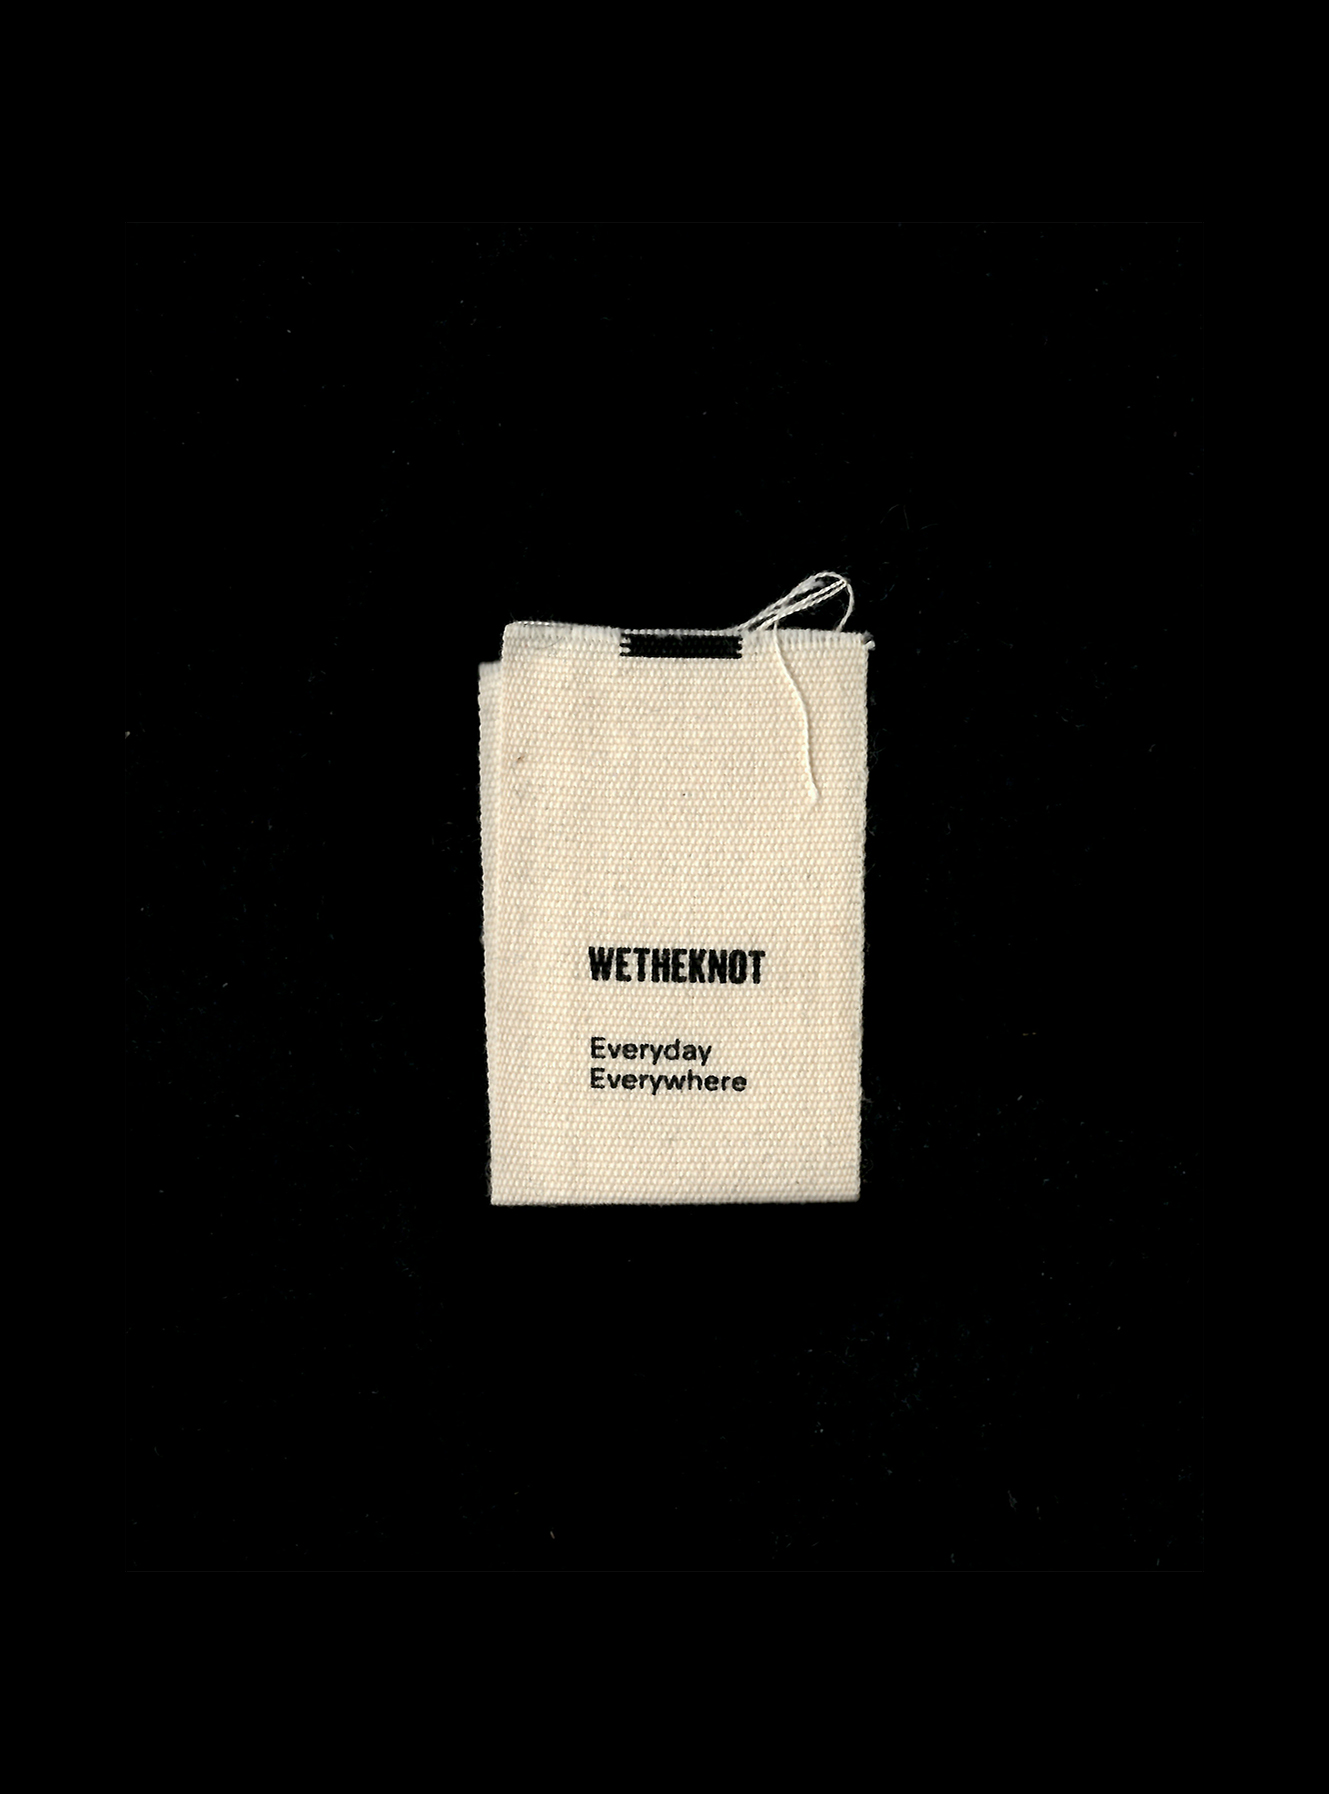 Everyday, everywhere — wetheknot's motto